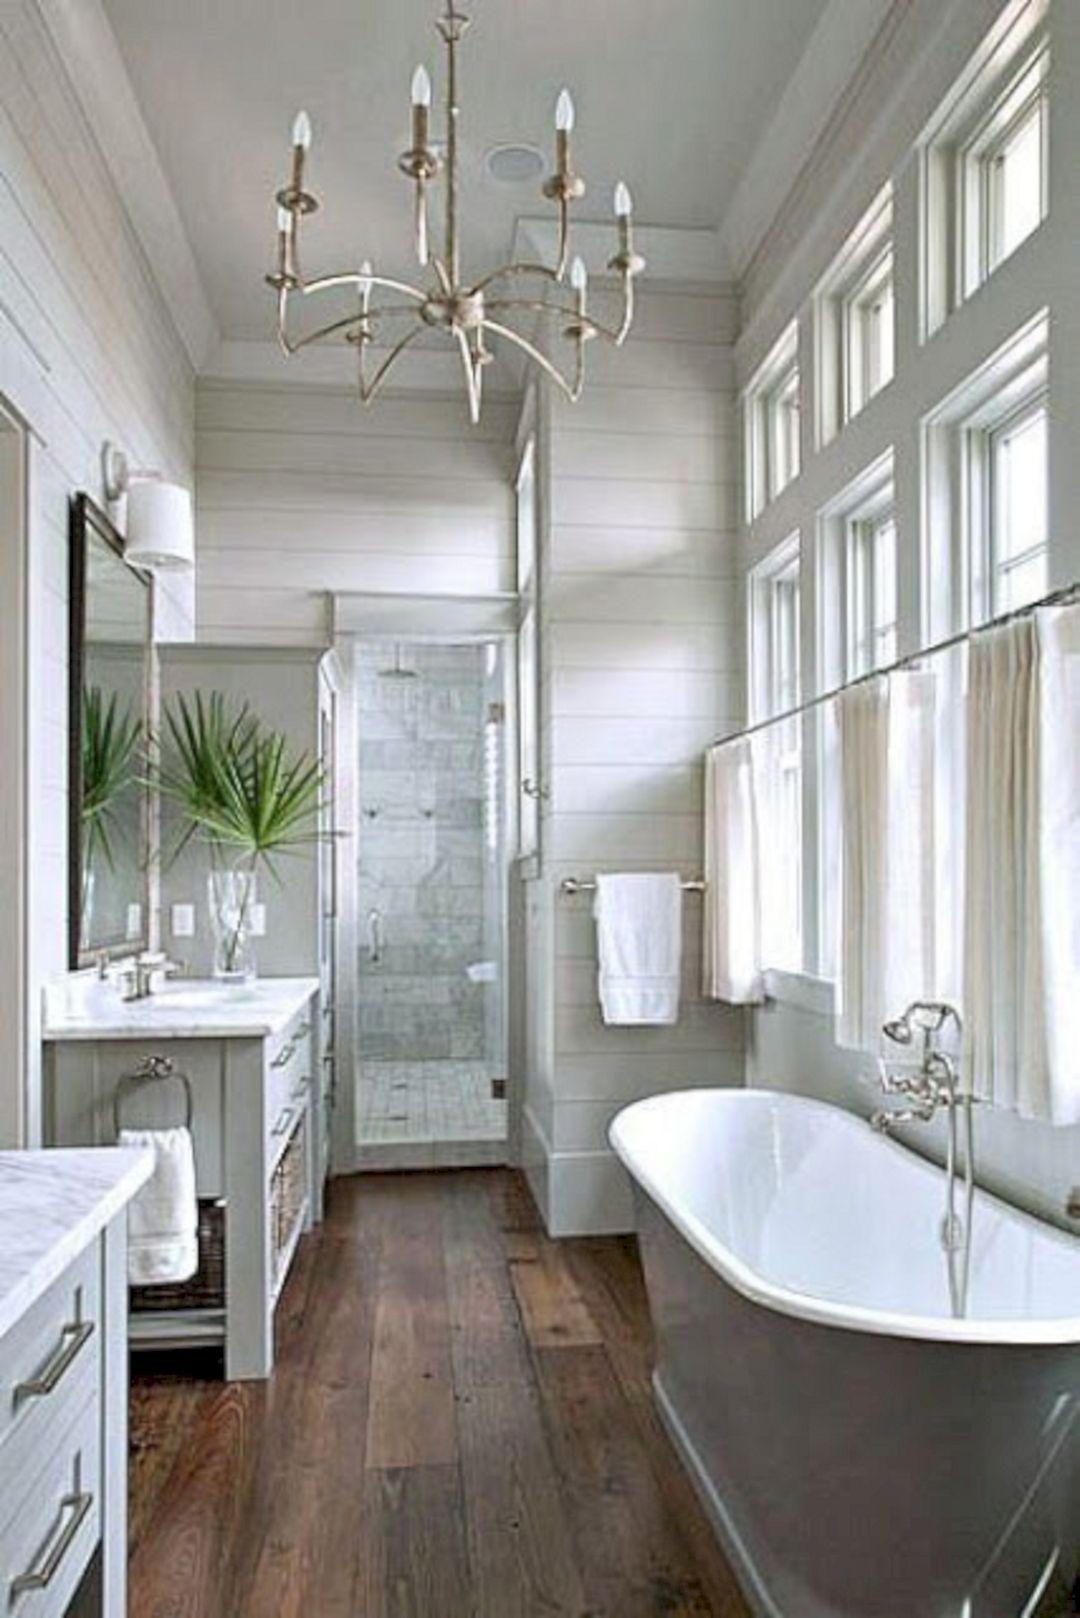 Top 5 Elegant French Country Home Architecture Ideas Freshouz Com Bathroom Remodel Master Dream Bathrooms Bathrooms Remodel